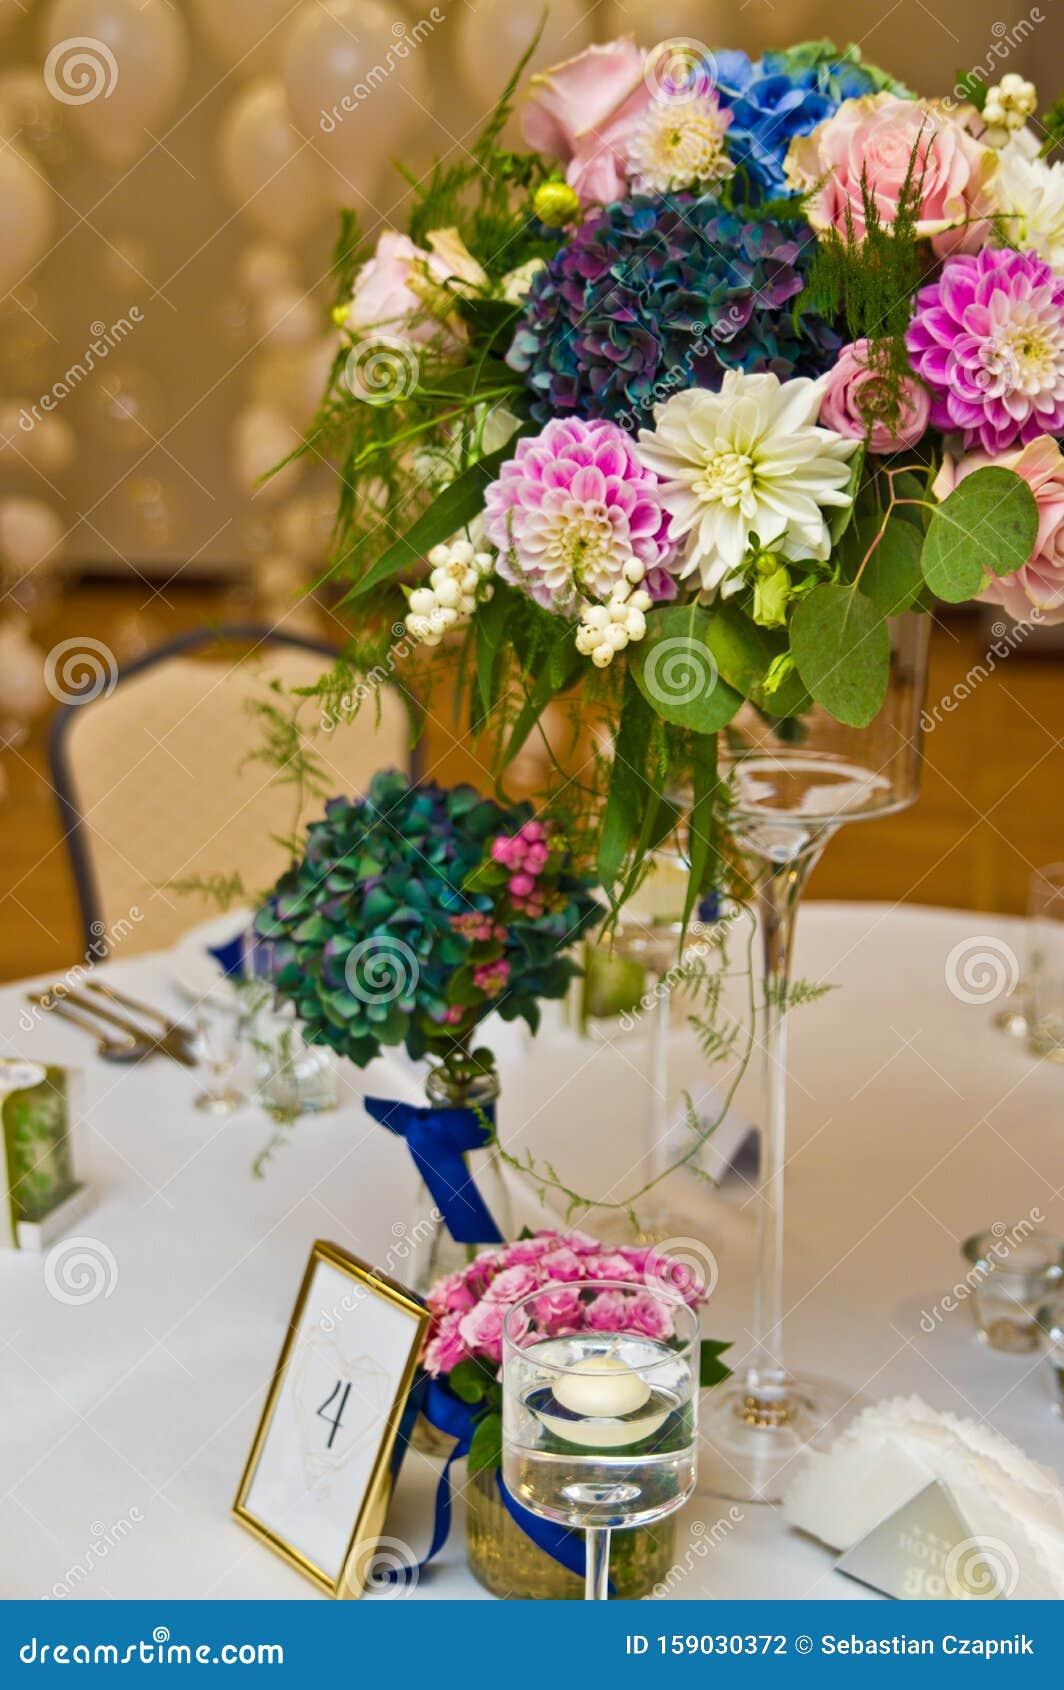 Wedding Hall Table Flowers Decoration Detail Stock Photo Image Of Ballroom Hall 159030372